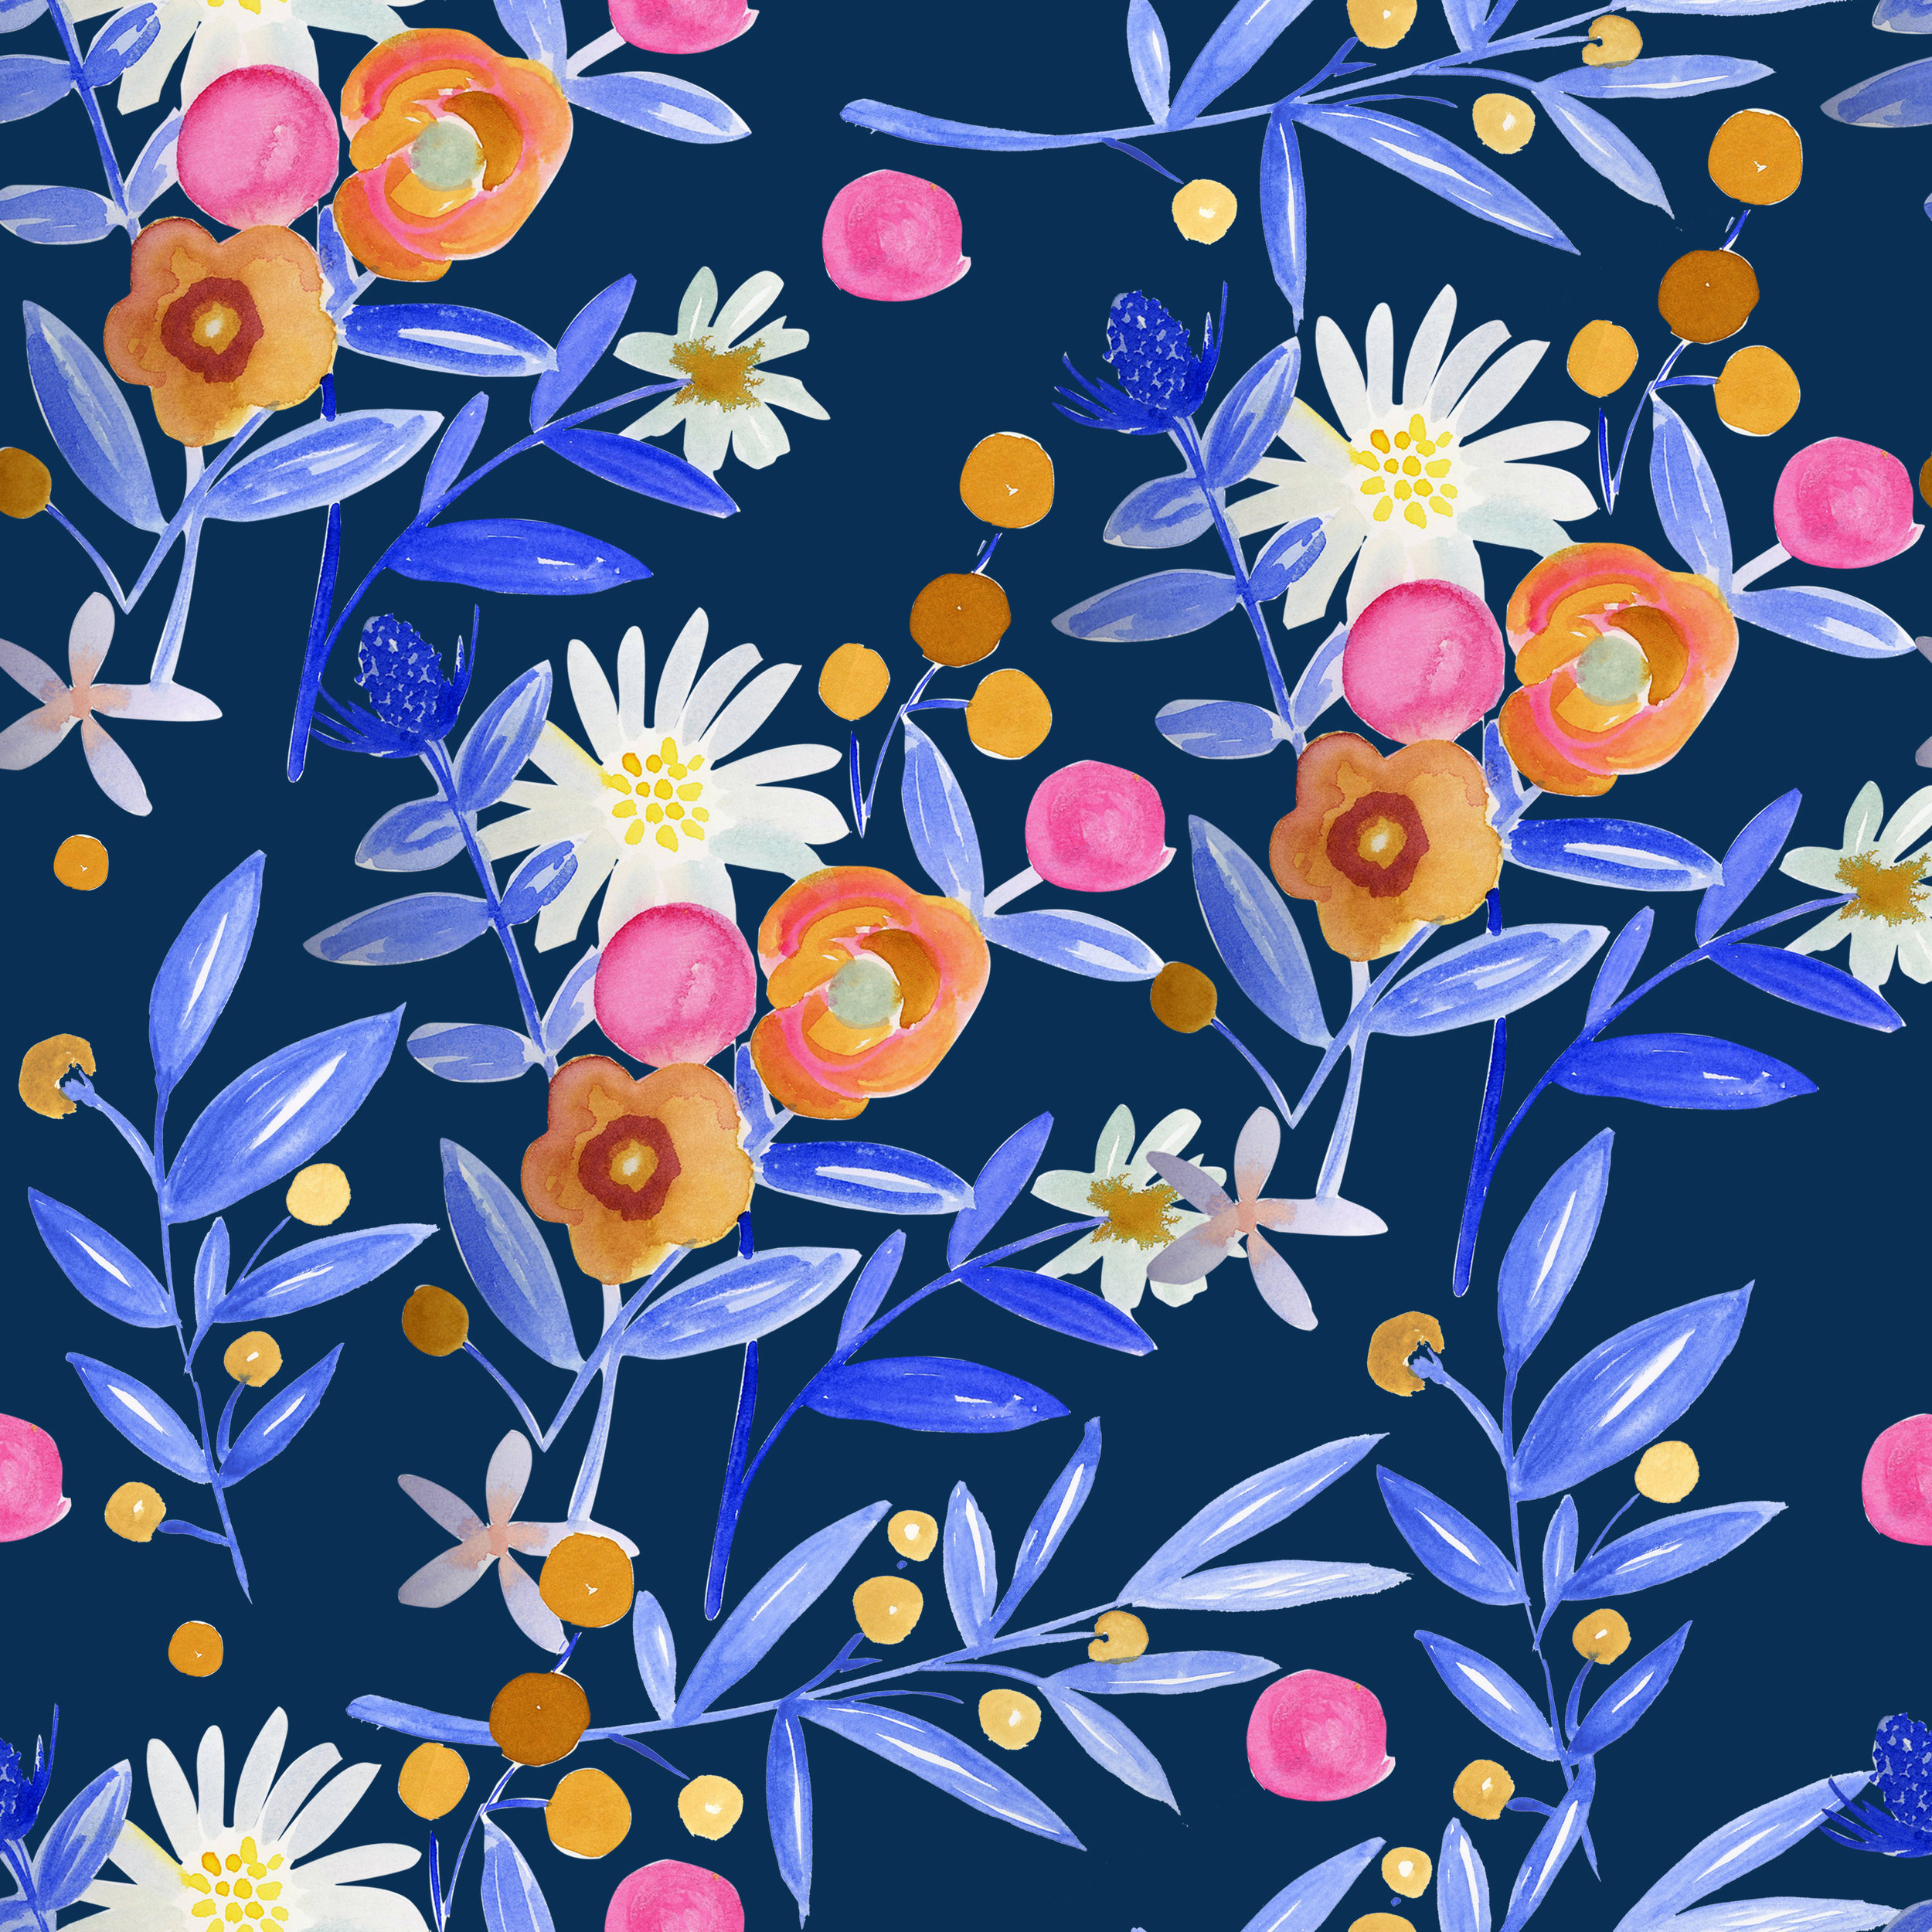 blueorangpinkflowers.jpg